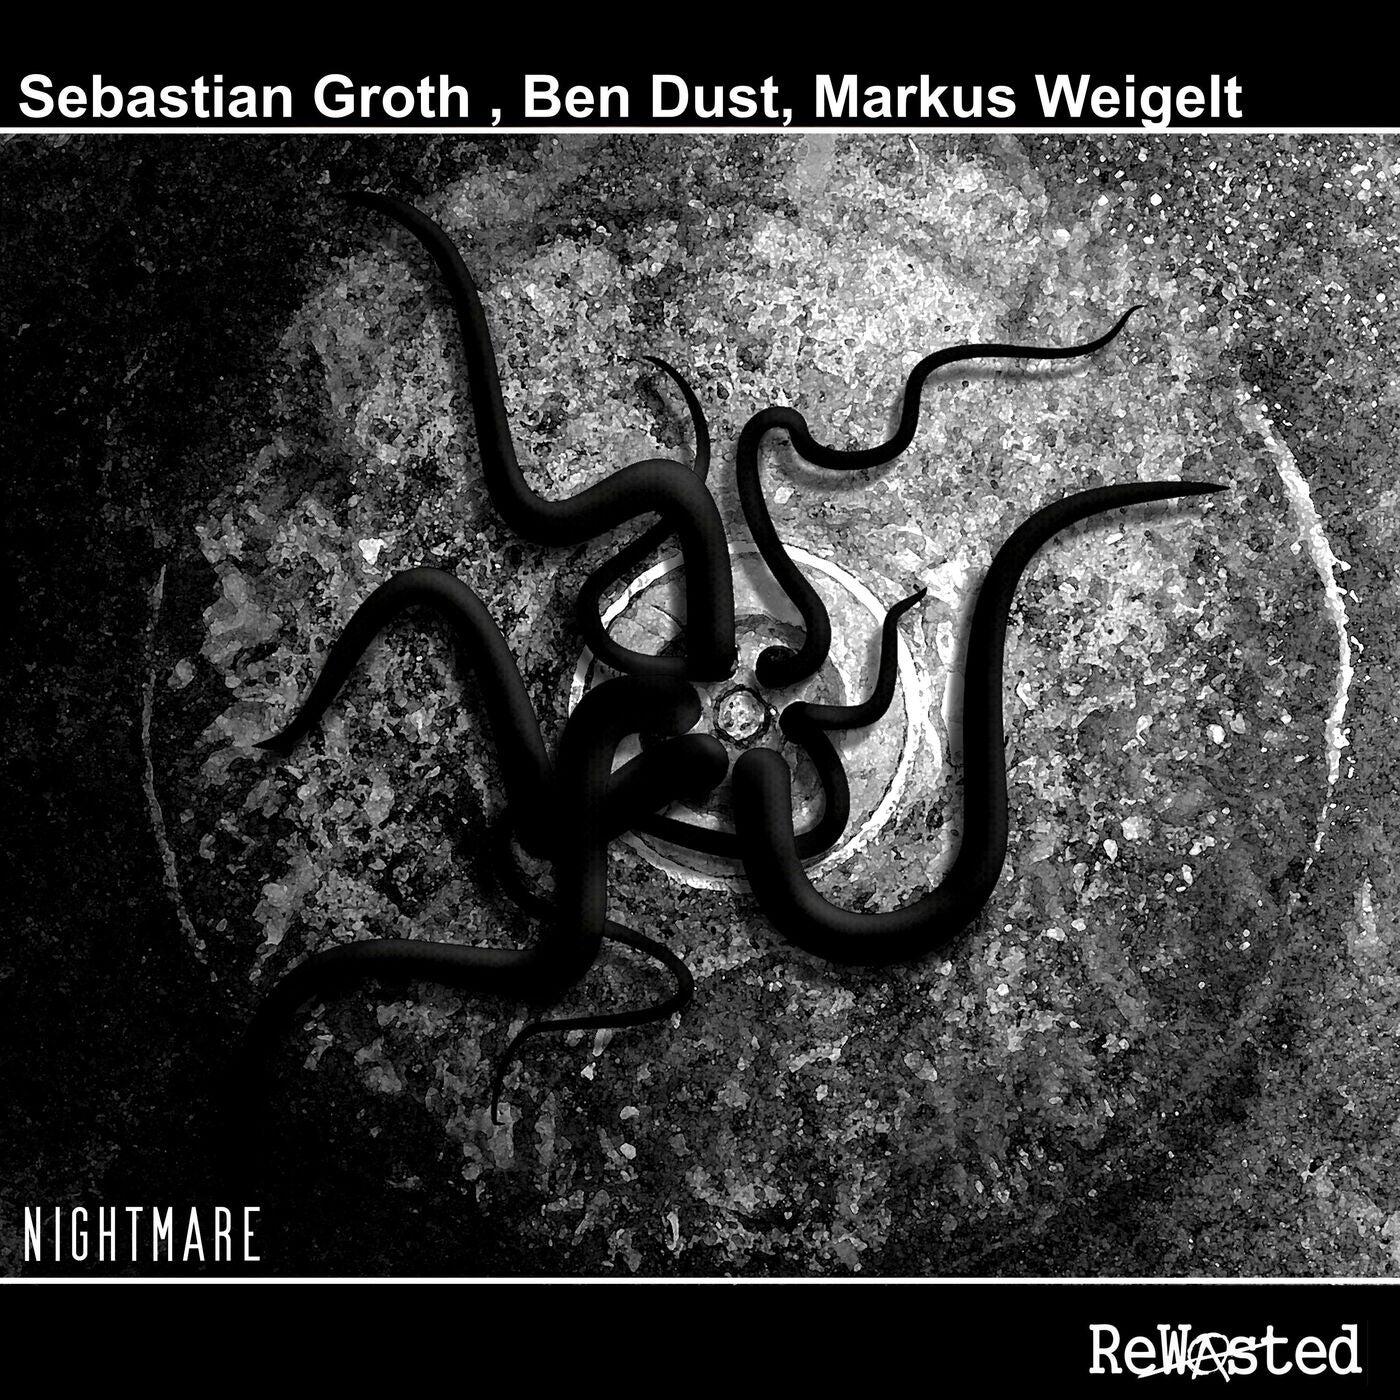 Nightmare (Original Mix)